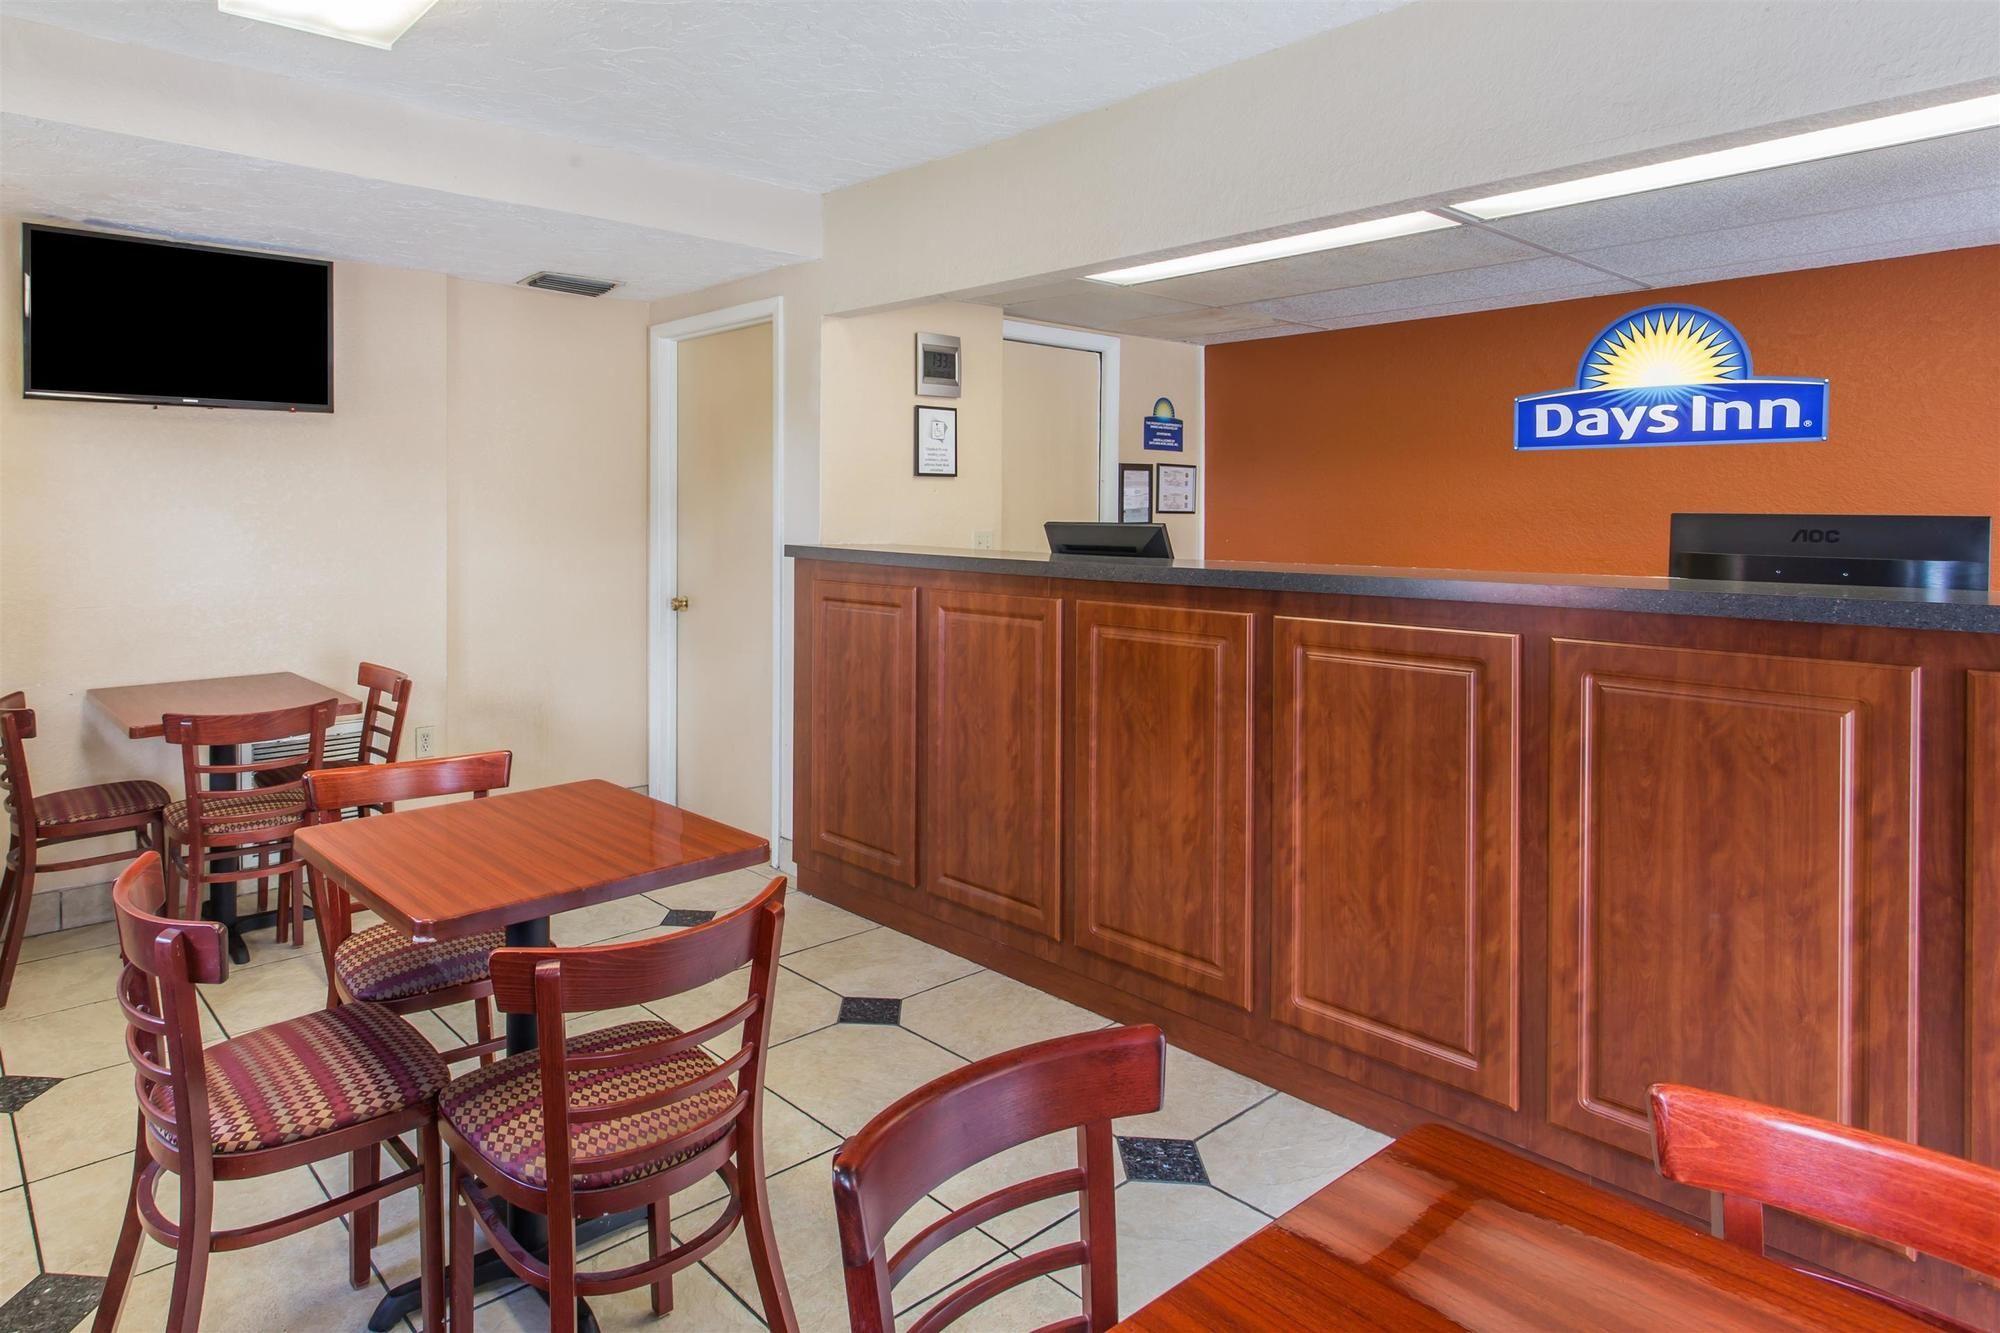 Days Inn Bradenton Interstate 75 in Bradenton, FL